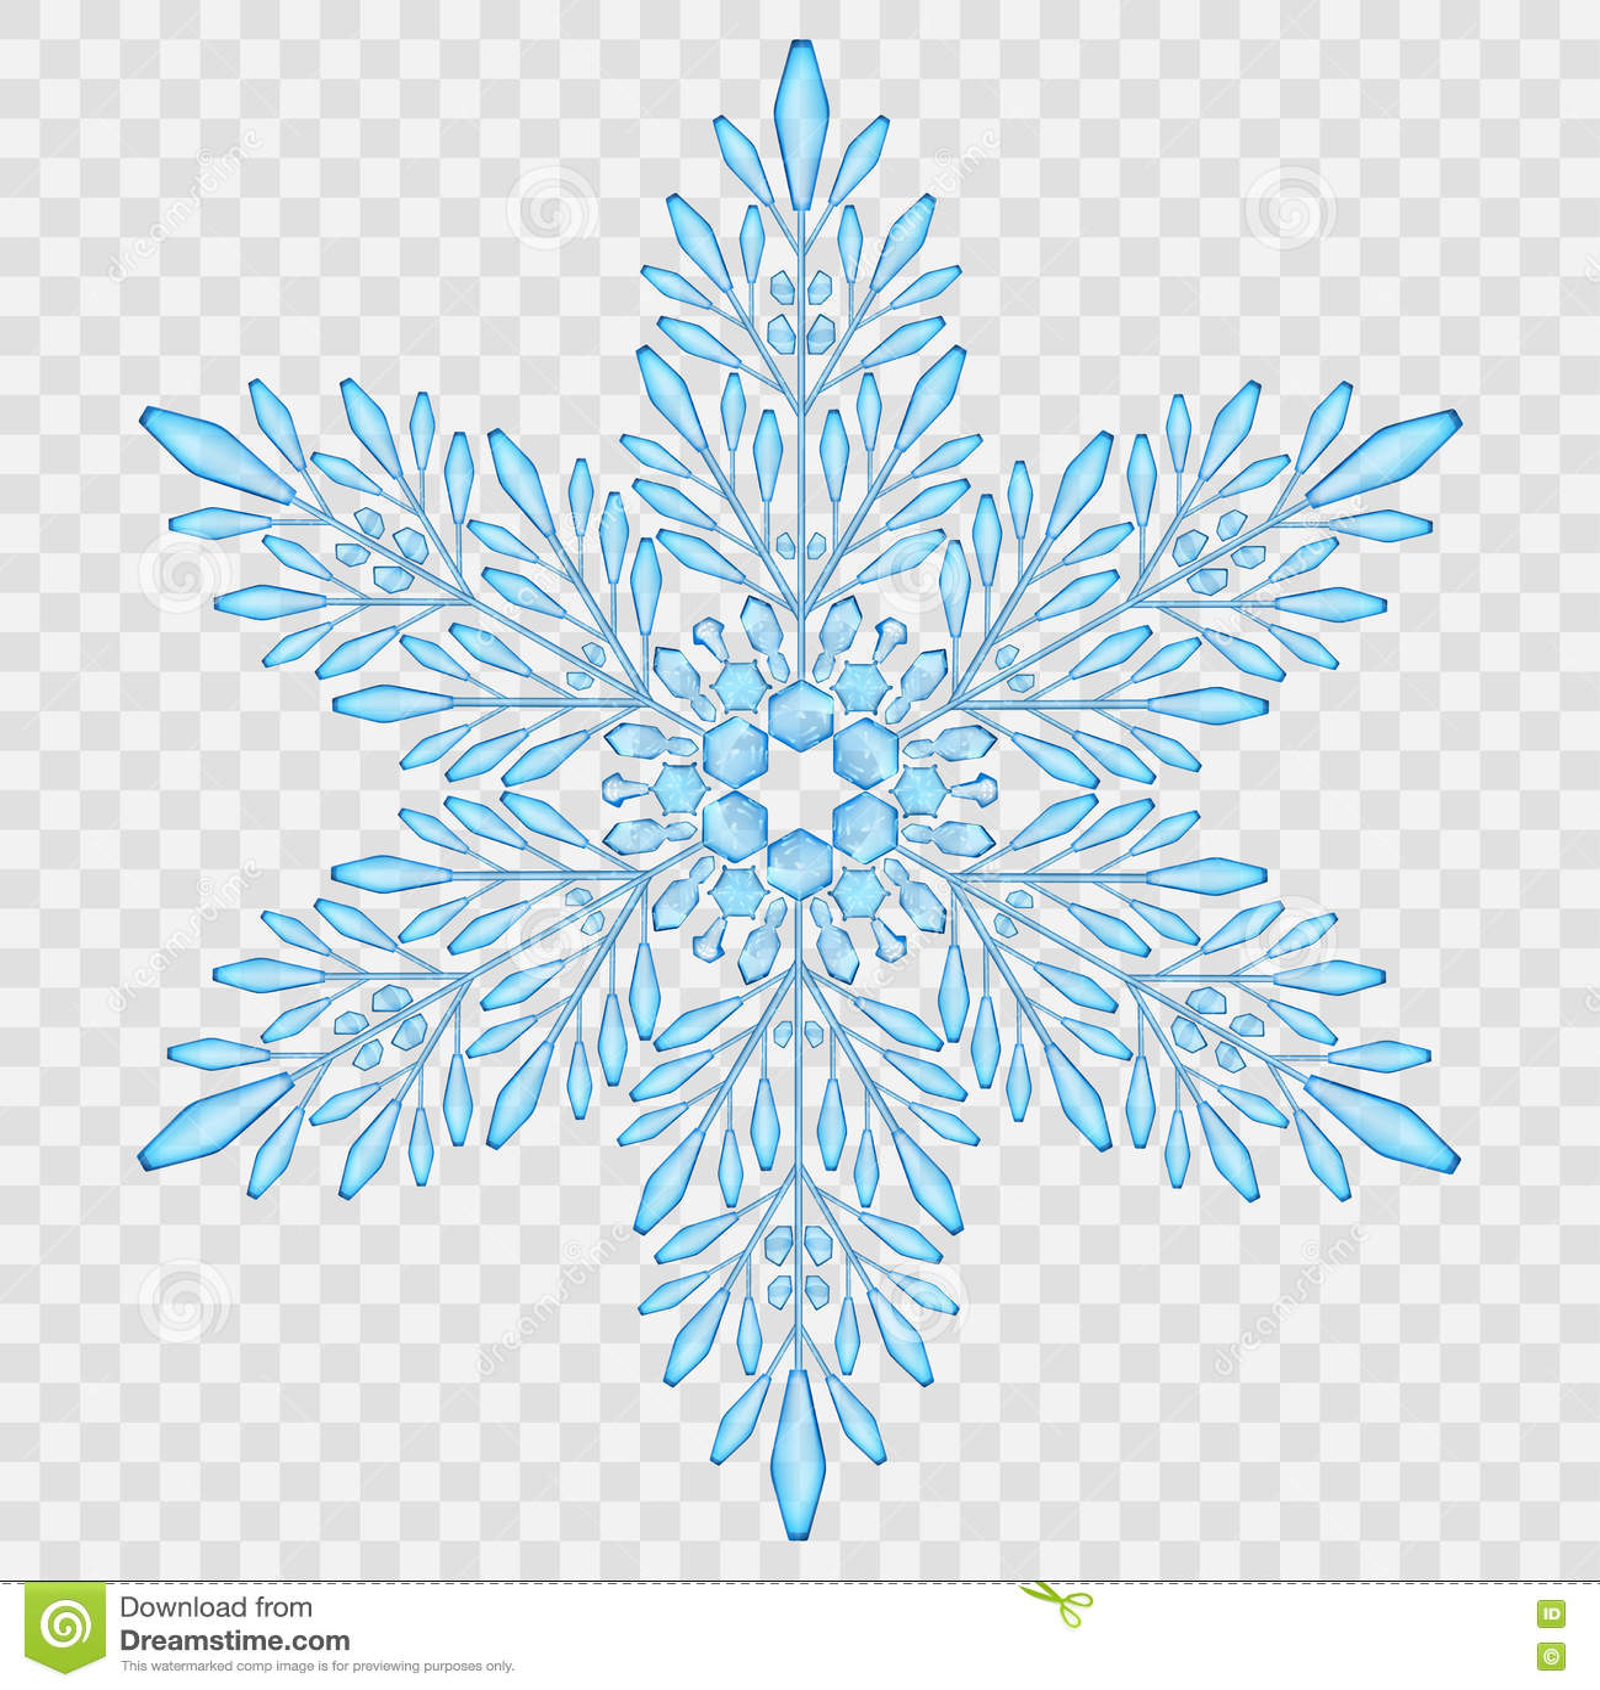 Blue snowflake transparent background pixshark